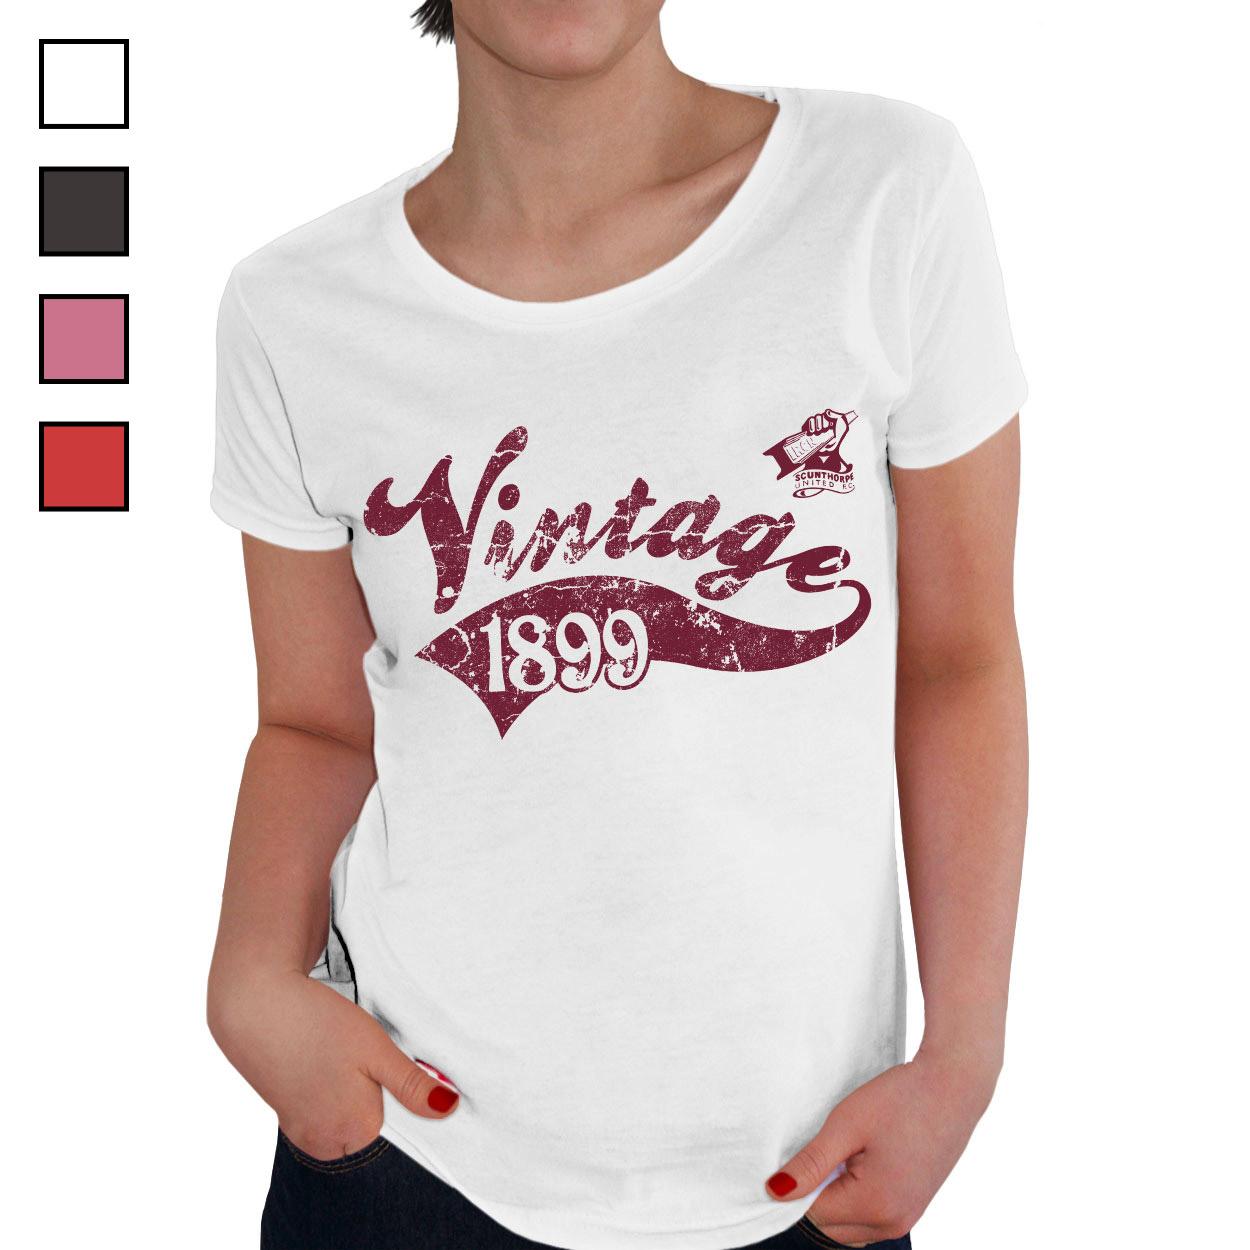 Scunthorpe United FC Ladies Vintage T-Shirt